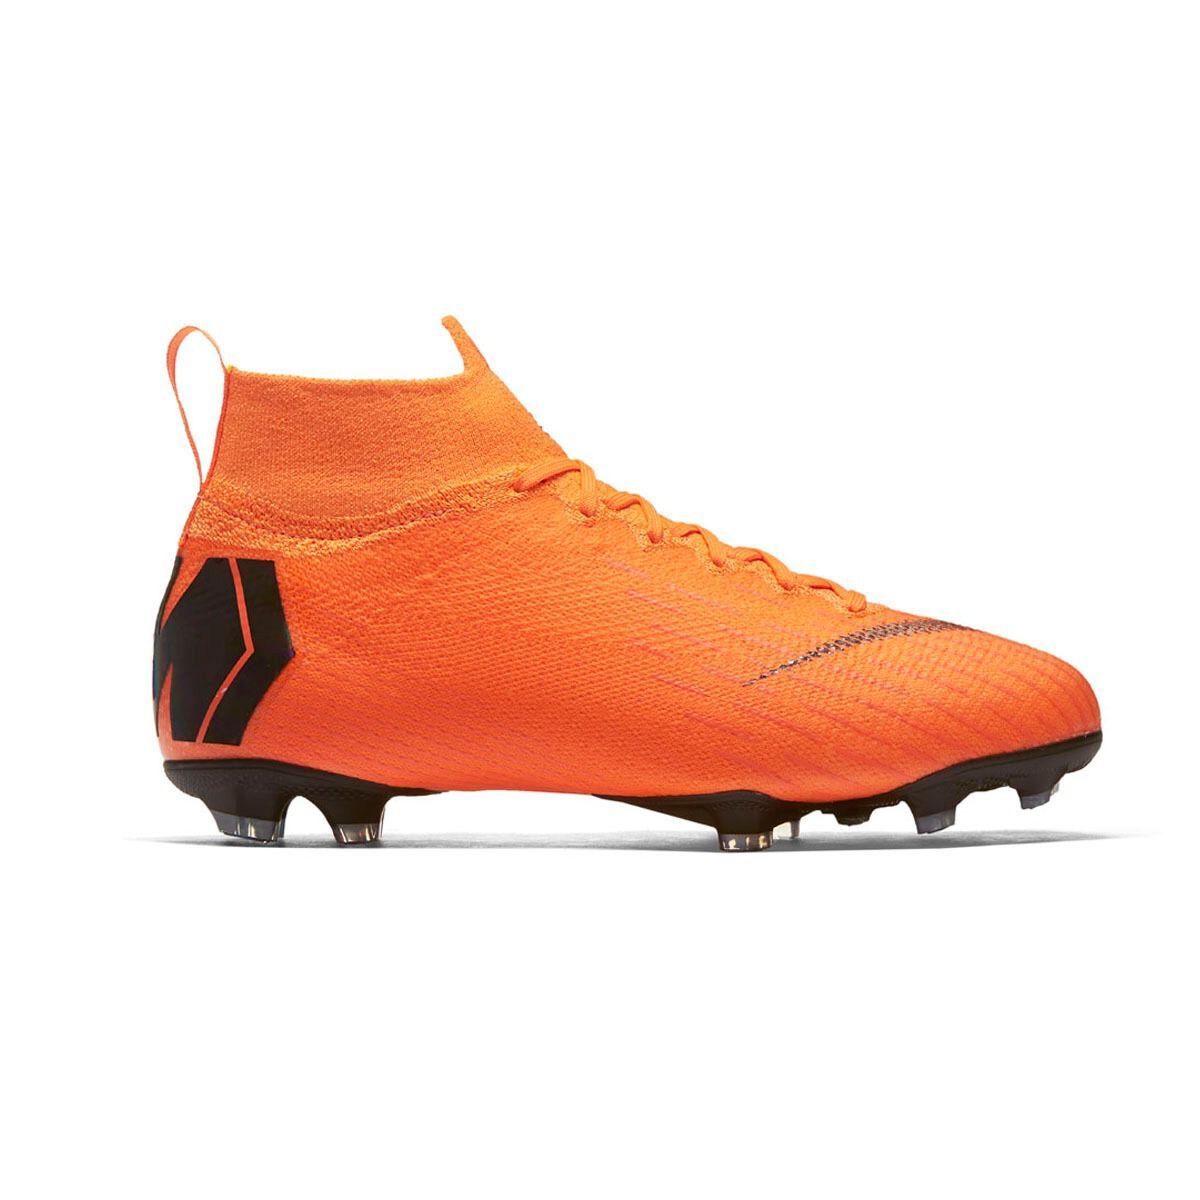 e2d26fa3c ... new arrivals nike mercurial superfly vi elite kids football boots  orange white us 4 junior orange